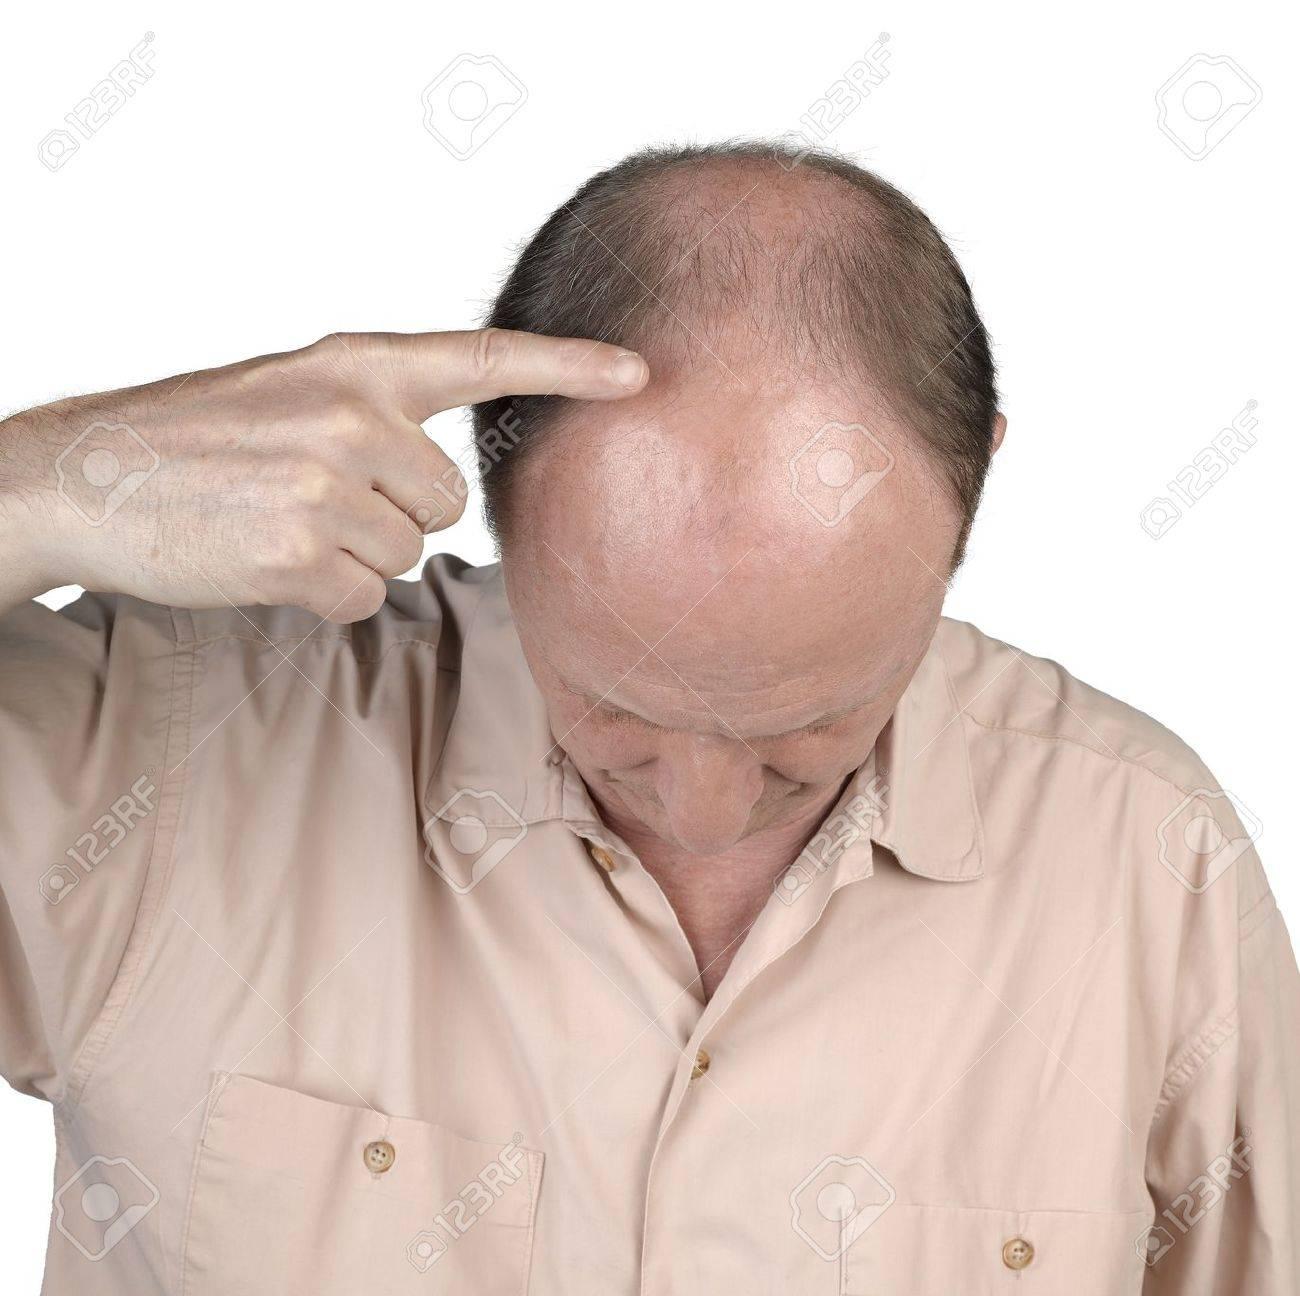 Human hair loss - adult man hand pointing his bald head Standard-Bild - 17389197